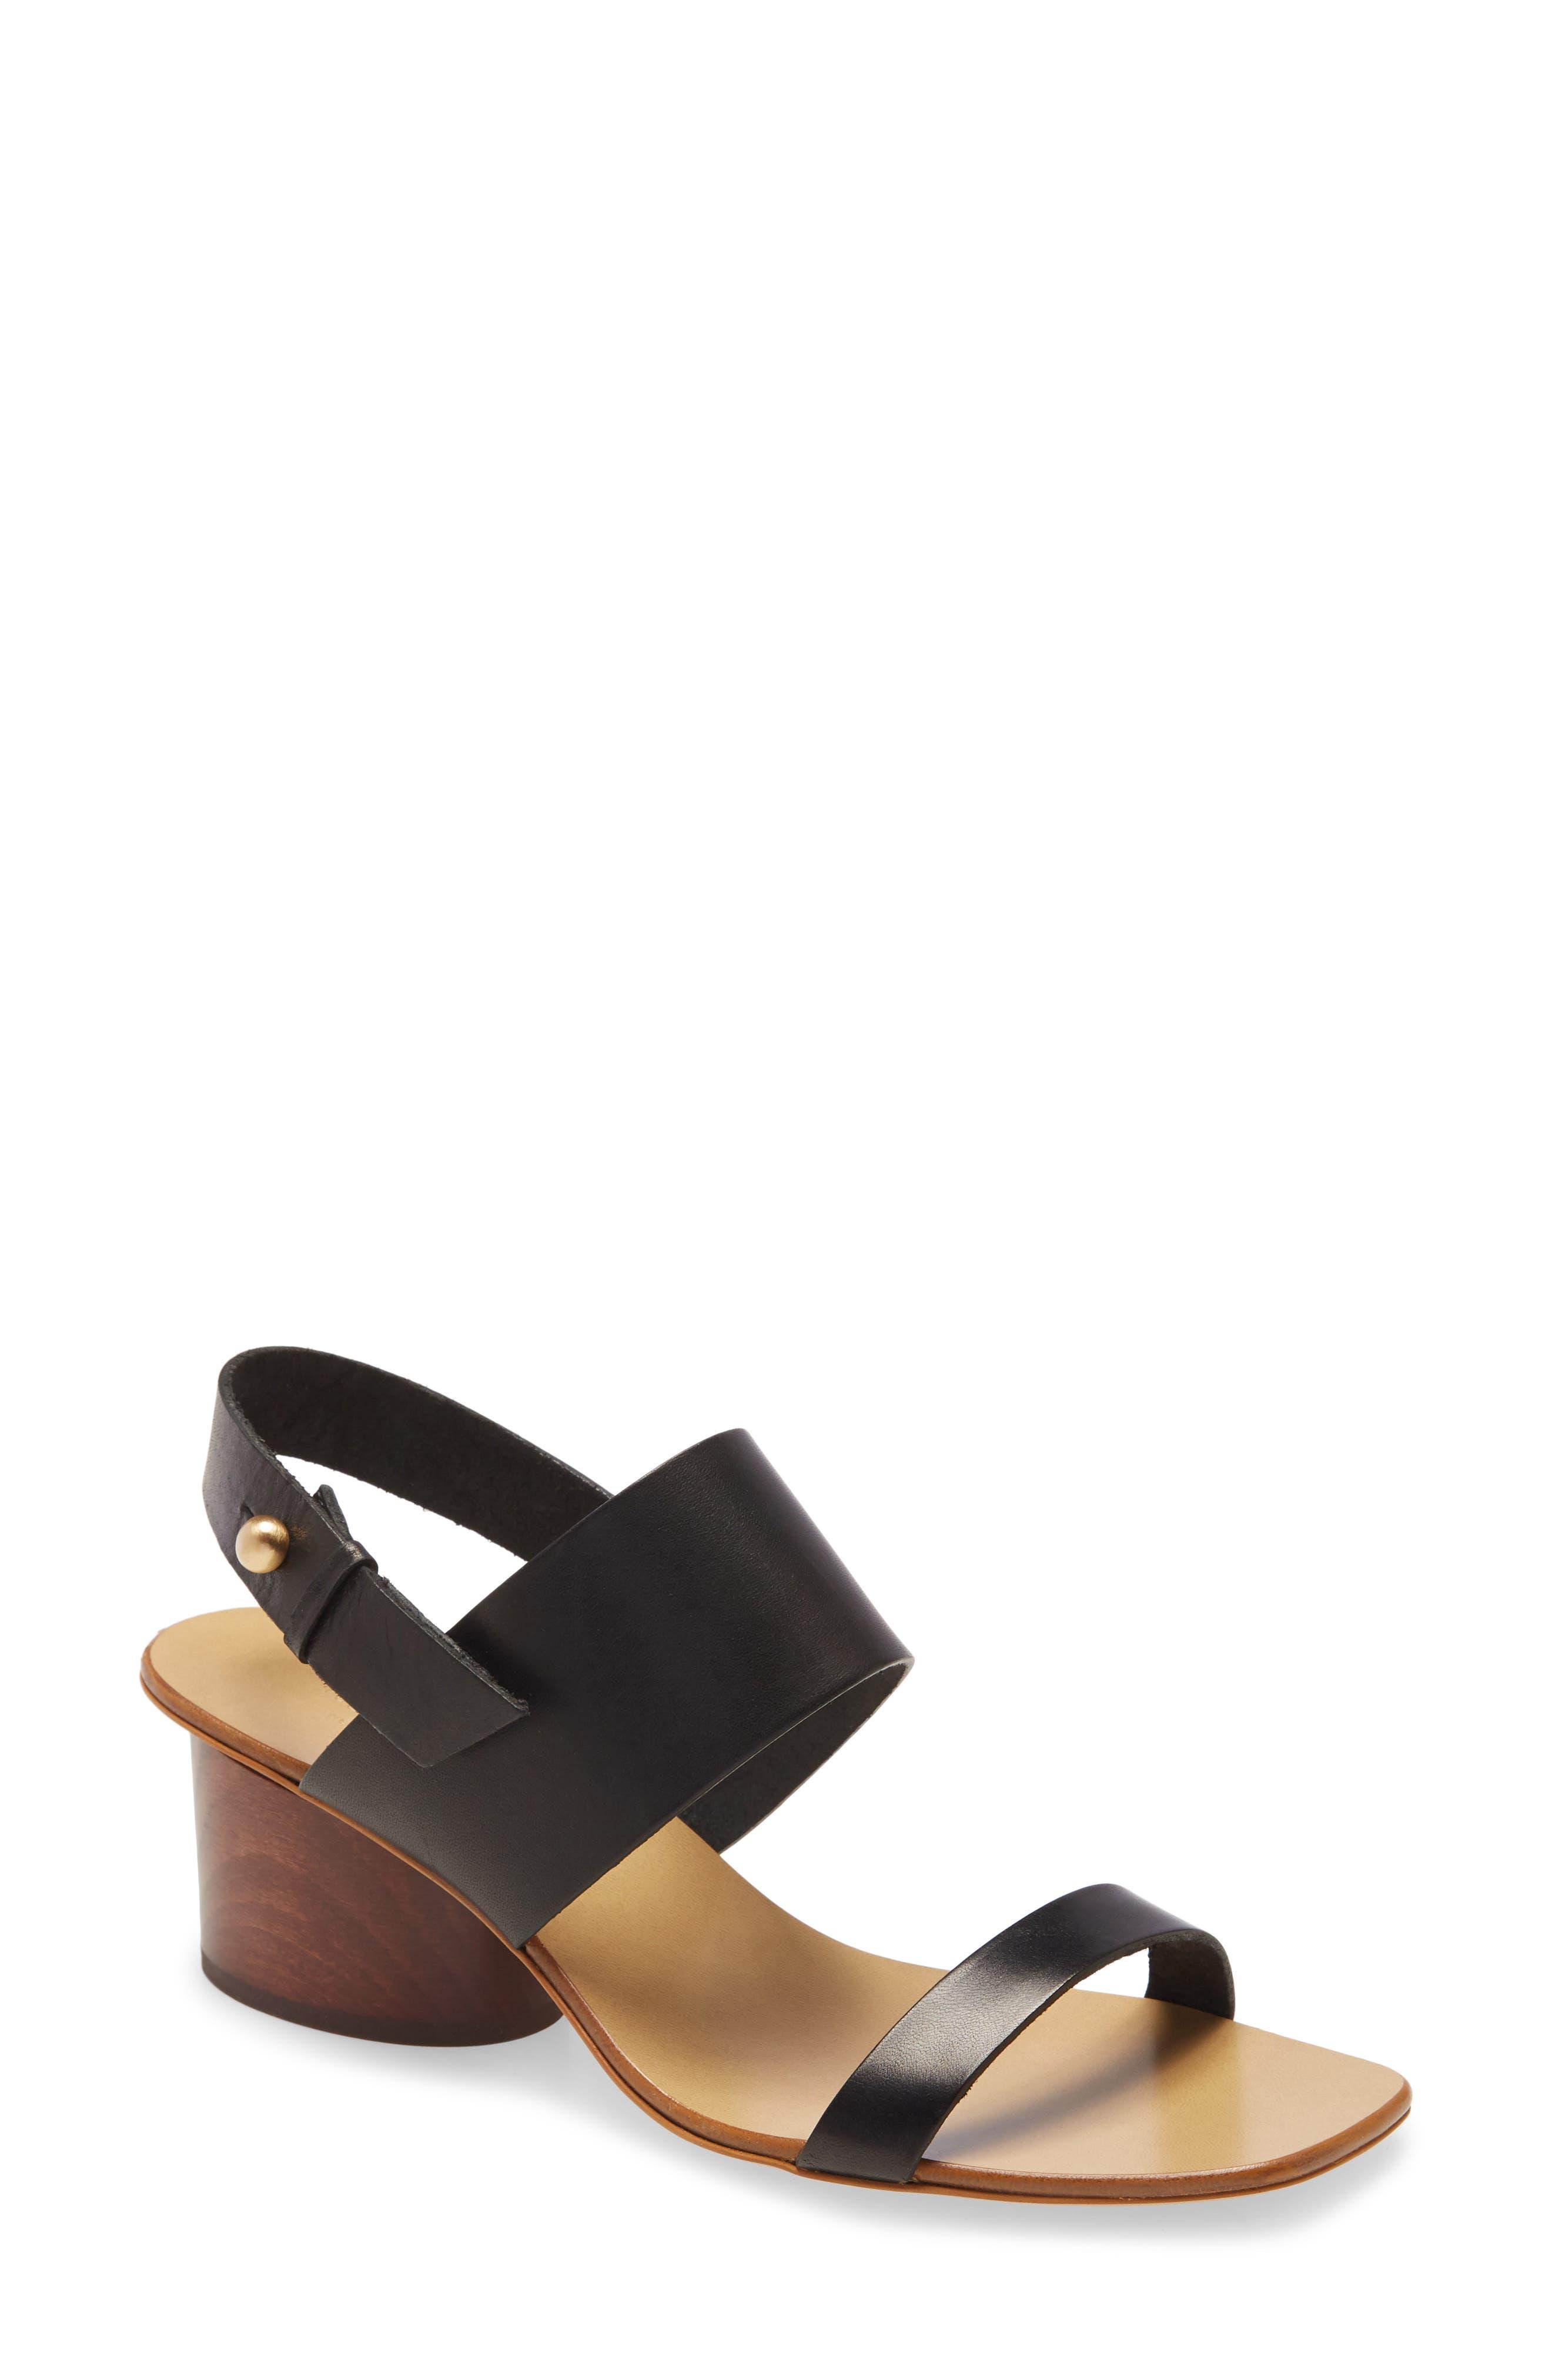 Image of Rag & Bone Round Heel Sandal